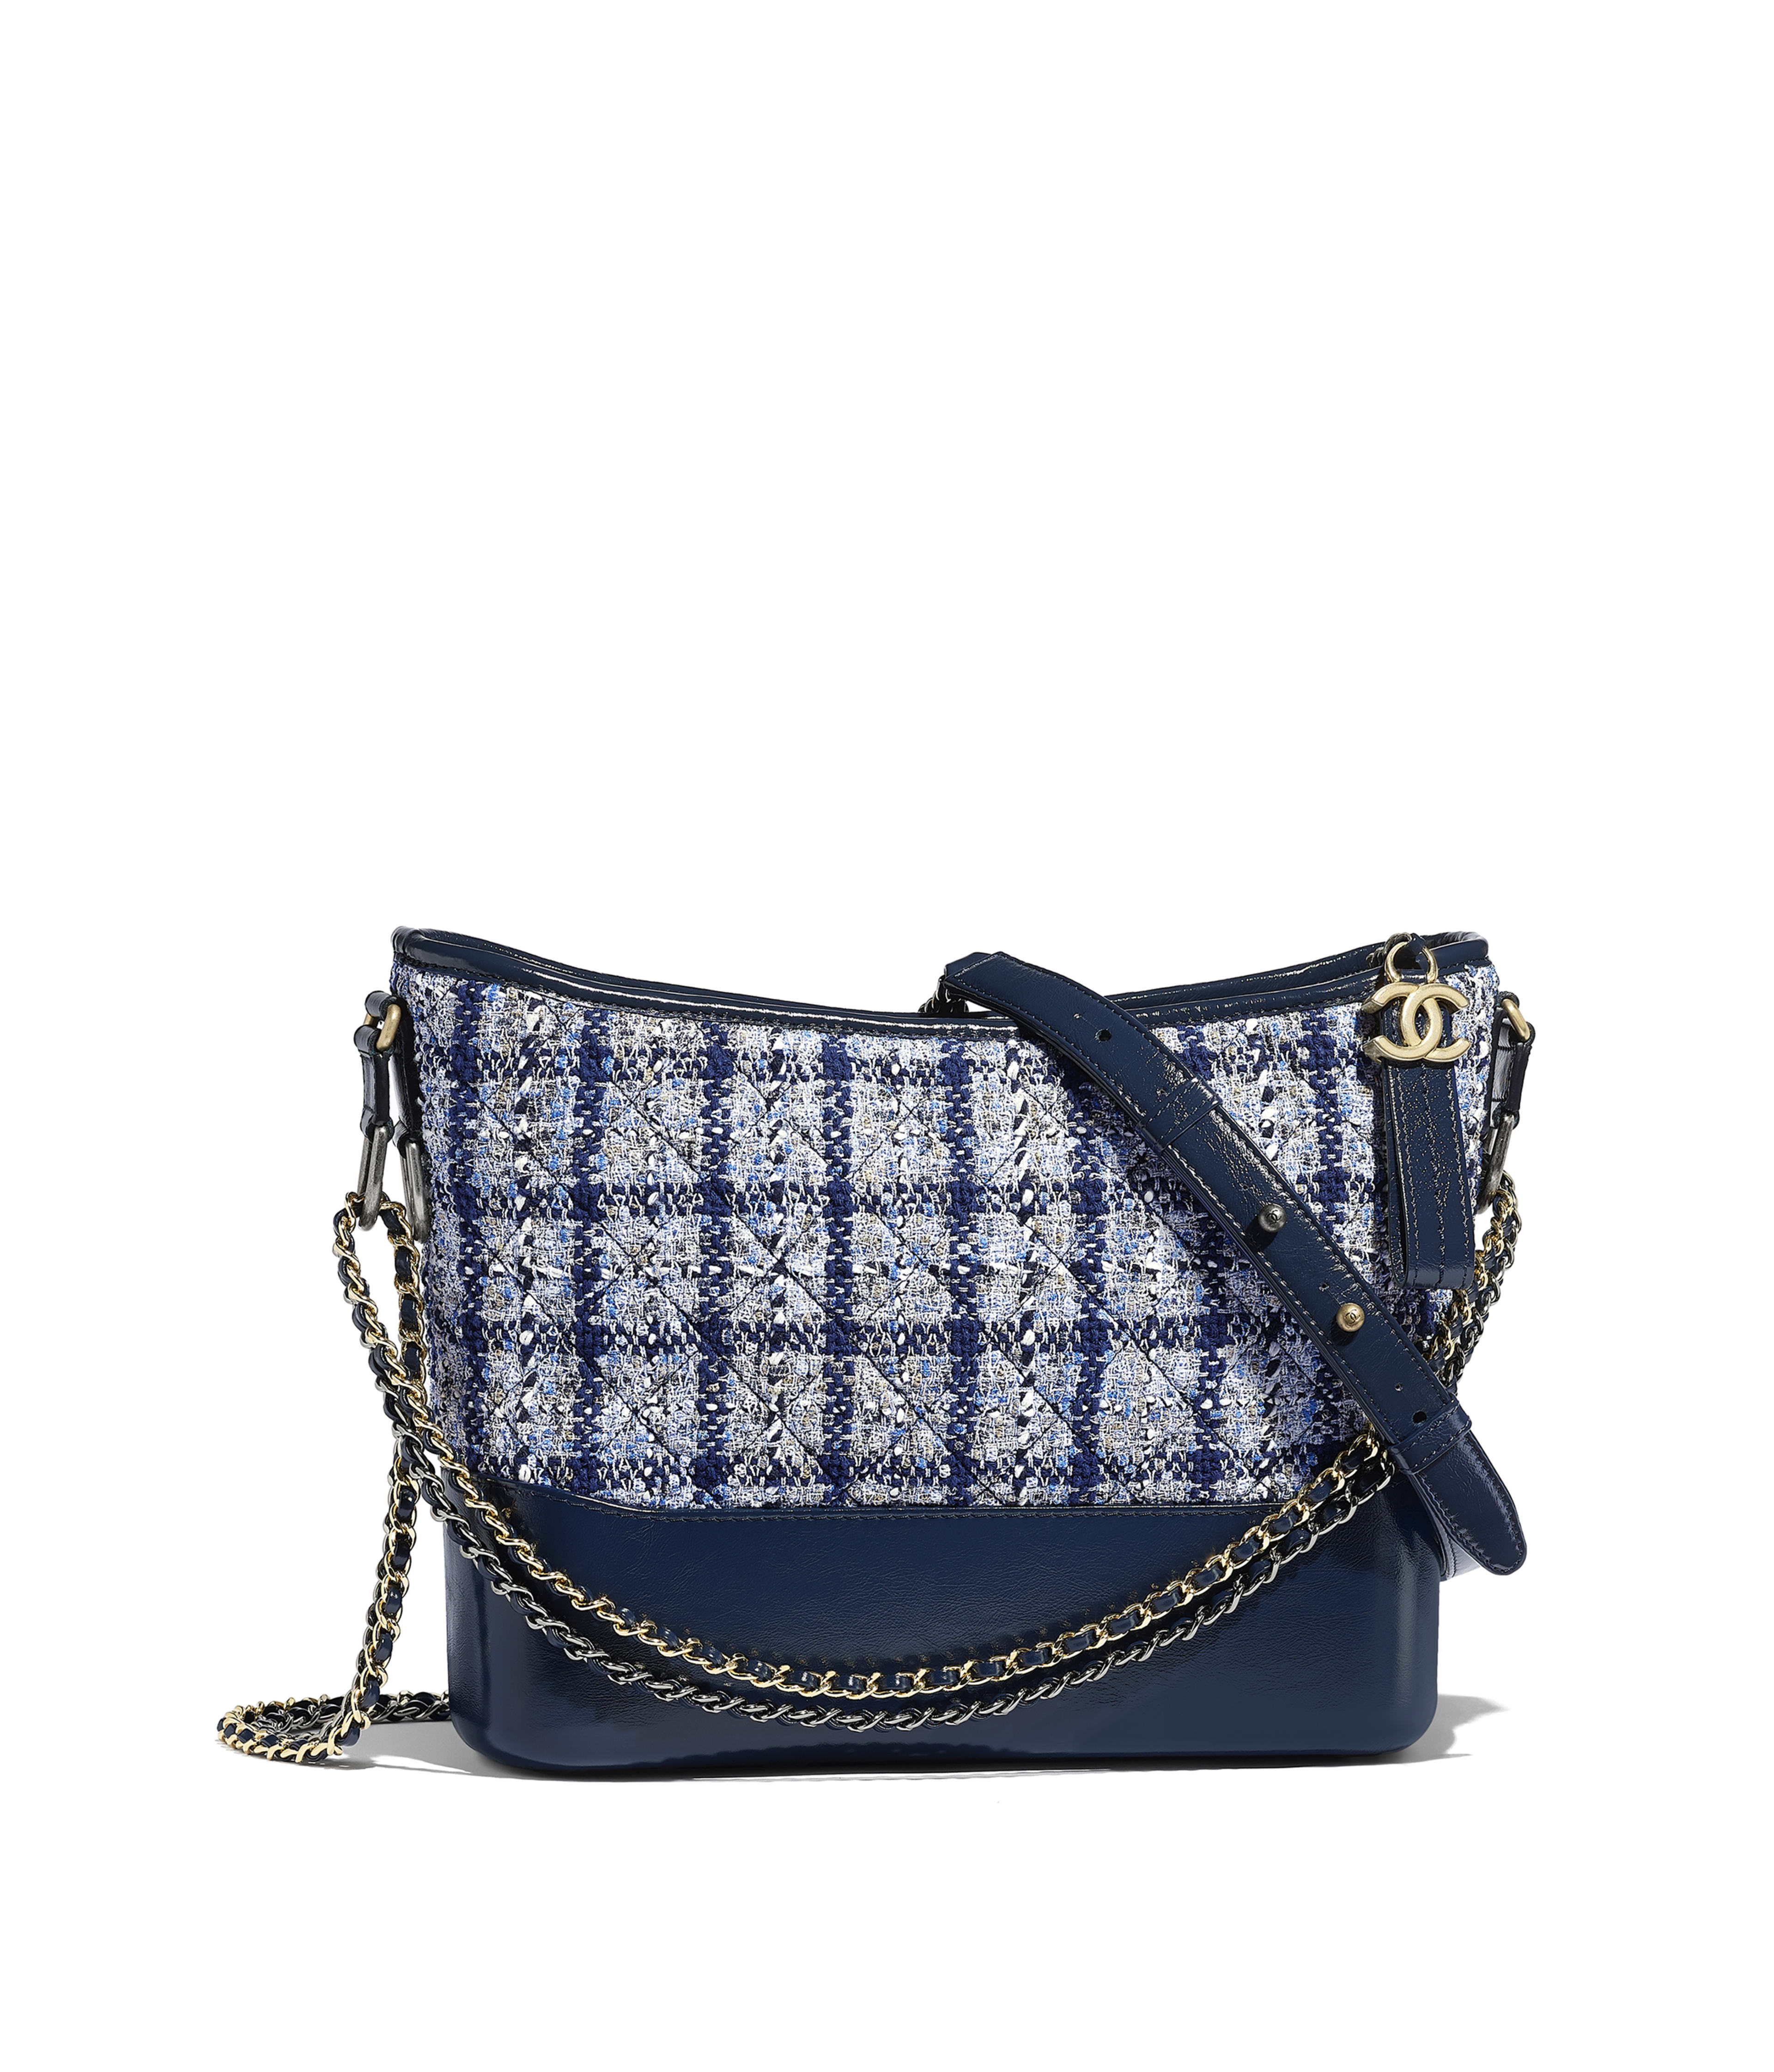 780f859bd69c CHANEL'S GABRIELLE Hobo Bag Tweed, Calfskin, Silver-Tone & Gold-Tone Metal,  Navy Blue, White & Silver Ref. A93824Y84202K1382